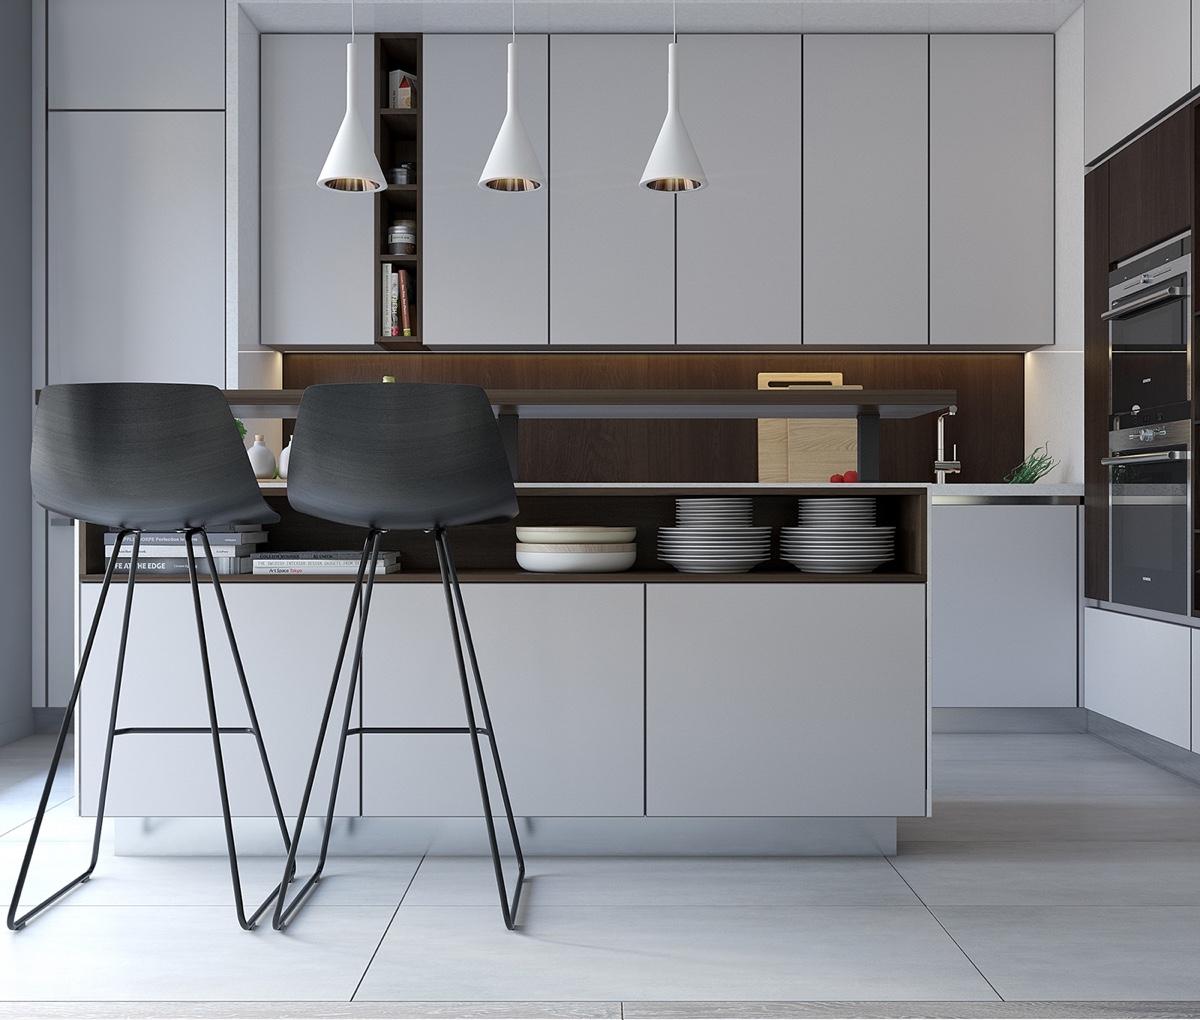 wooden concept for kitchen design